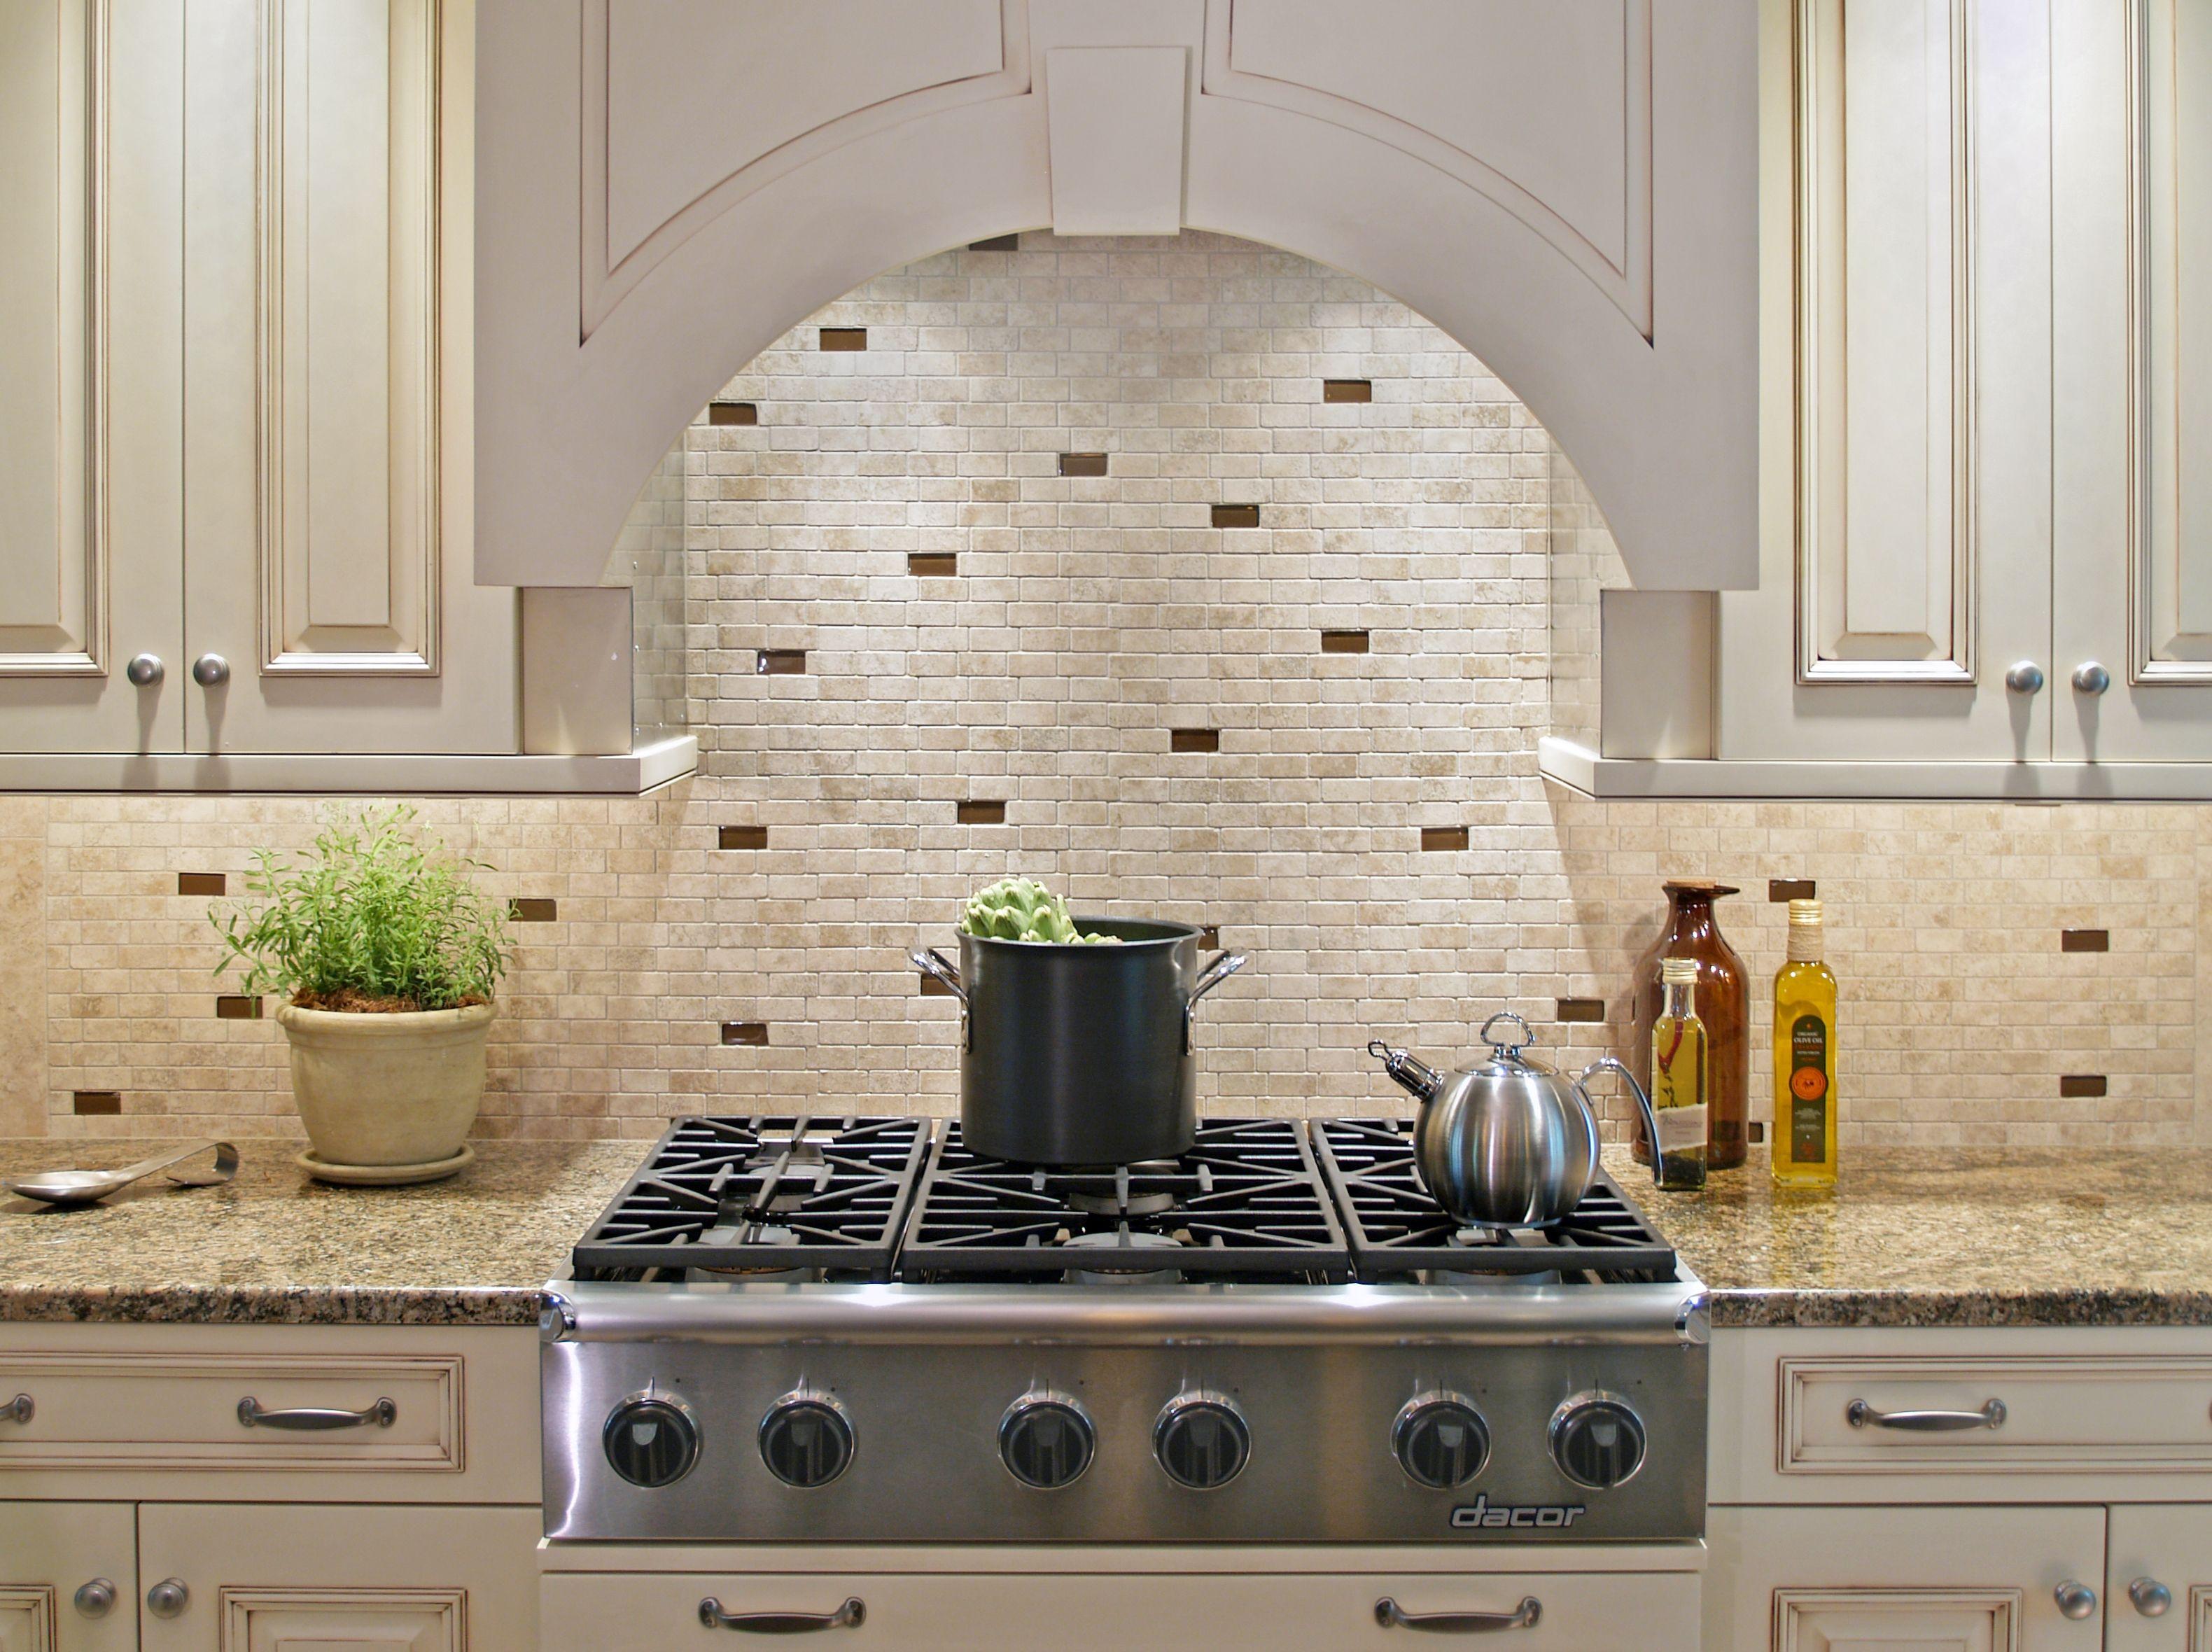 Unique Kitchen Backsplashes For Elegant Wall Best Options Modern Traditional